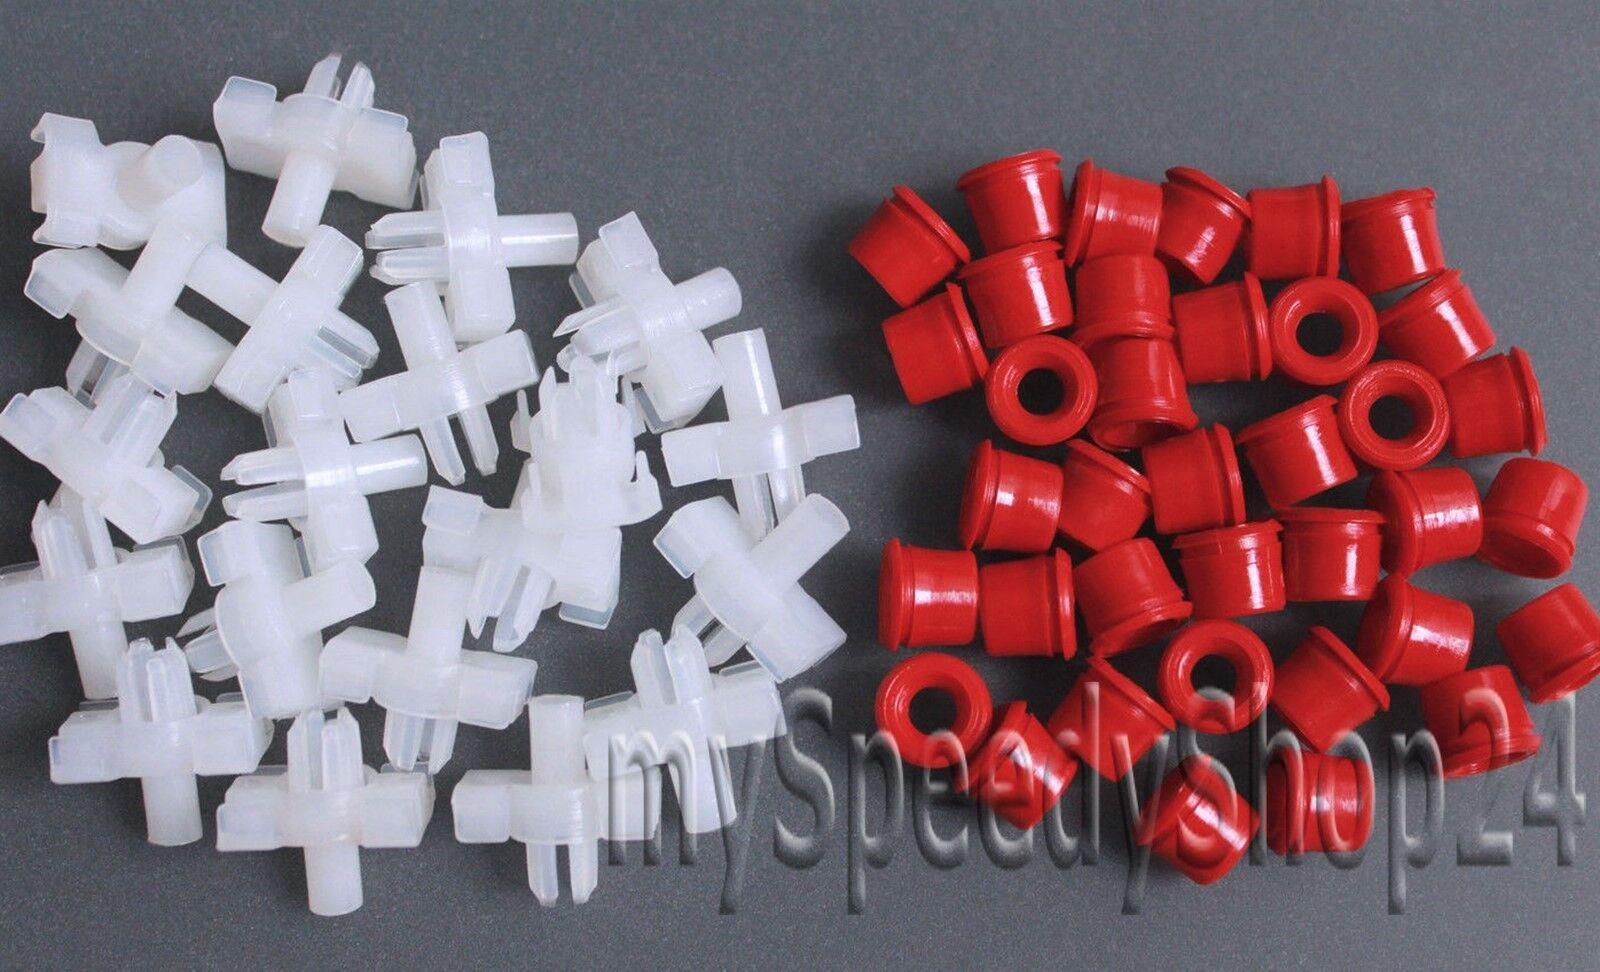 30 piezas paréntesis clips beplankung para mercedes Sacco 190 w201 w124 a124 s124